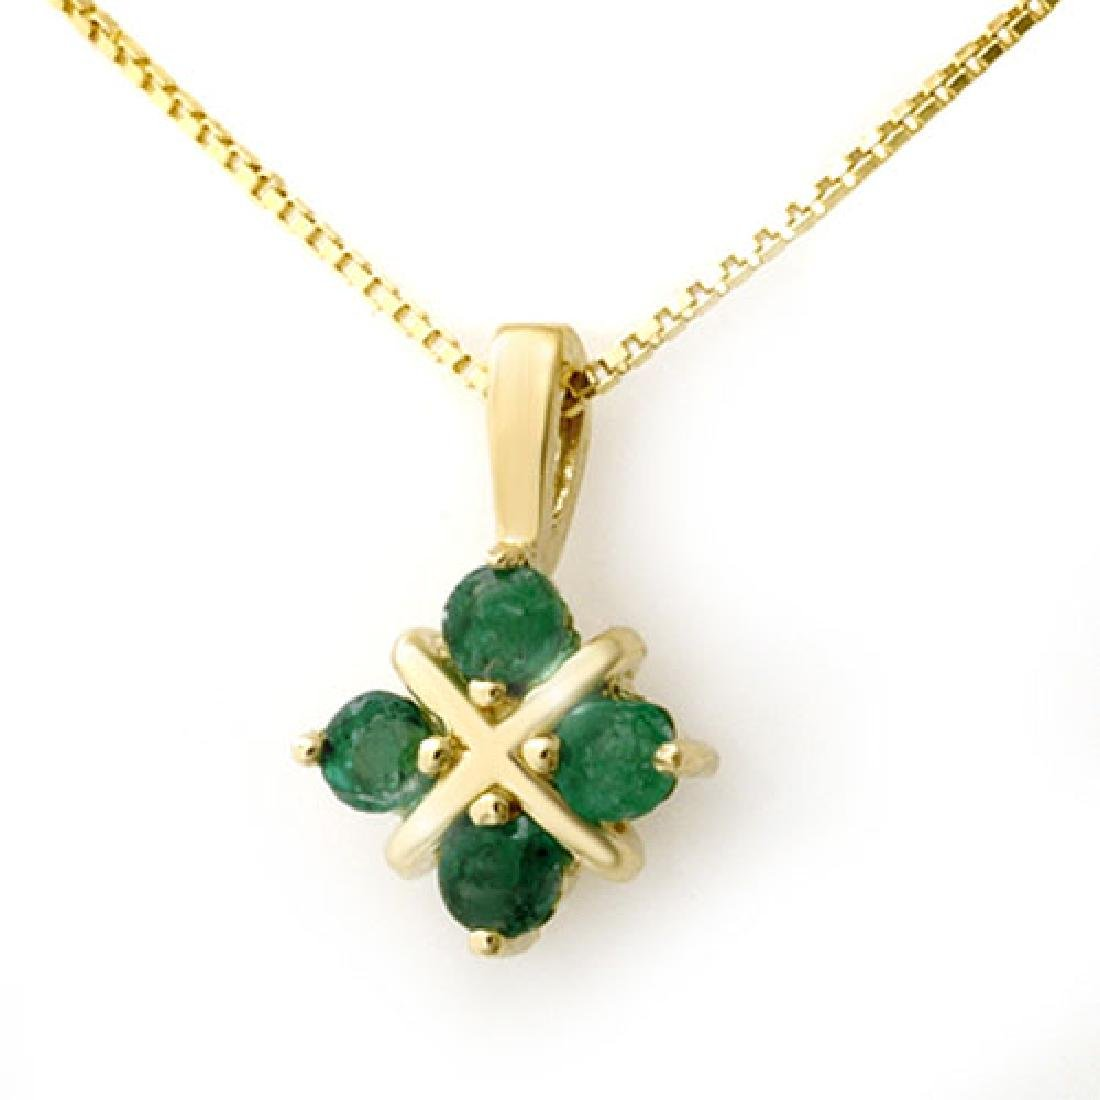 0.38 CTW Emerald Pendant 10K Yellow Gold